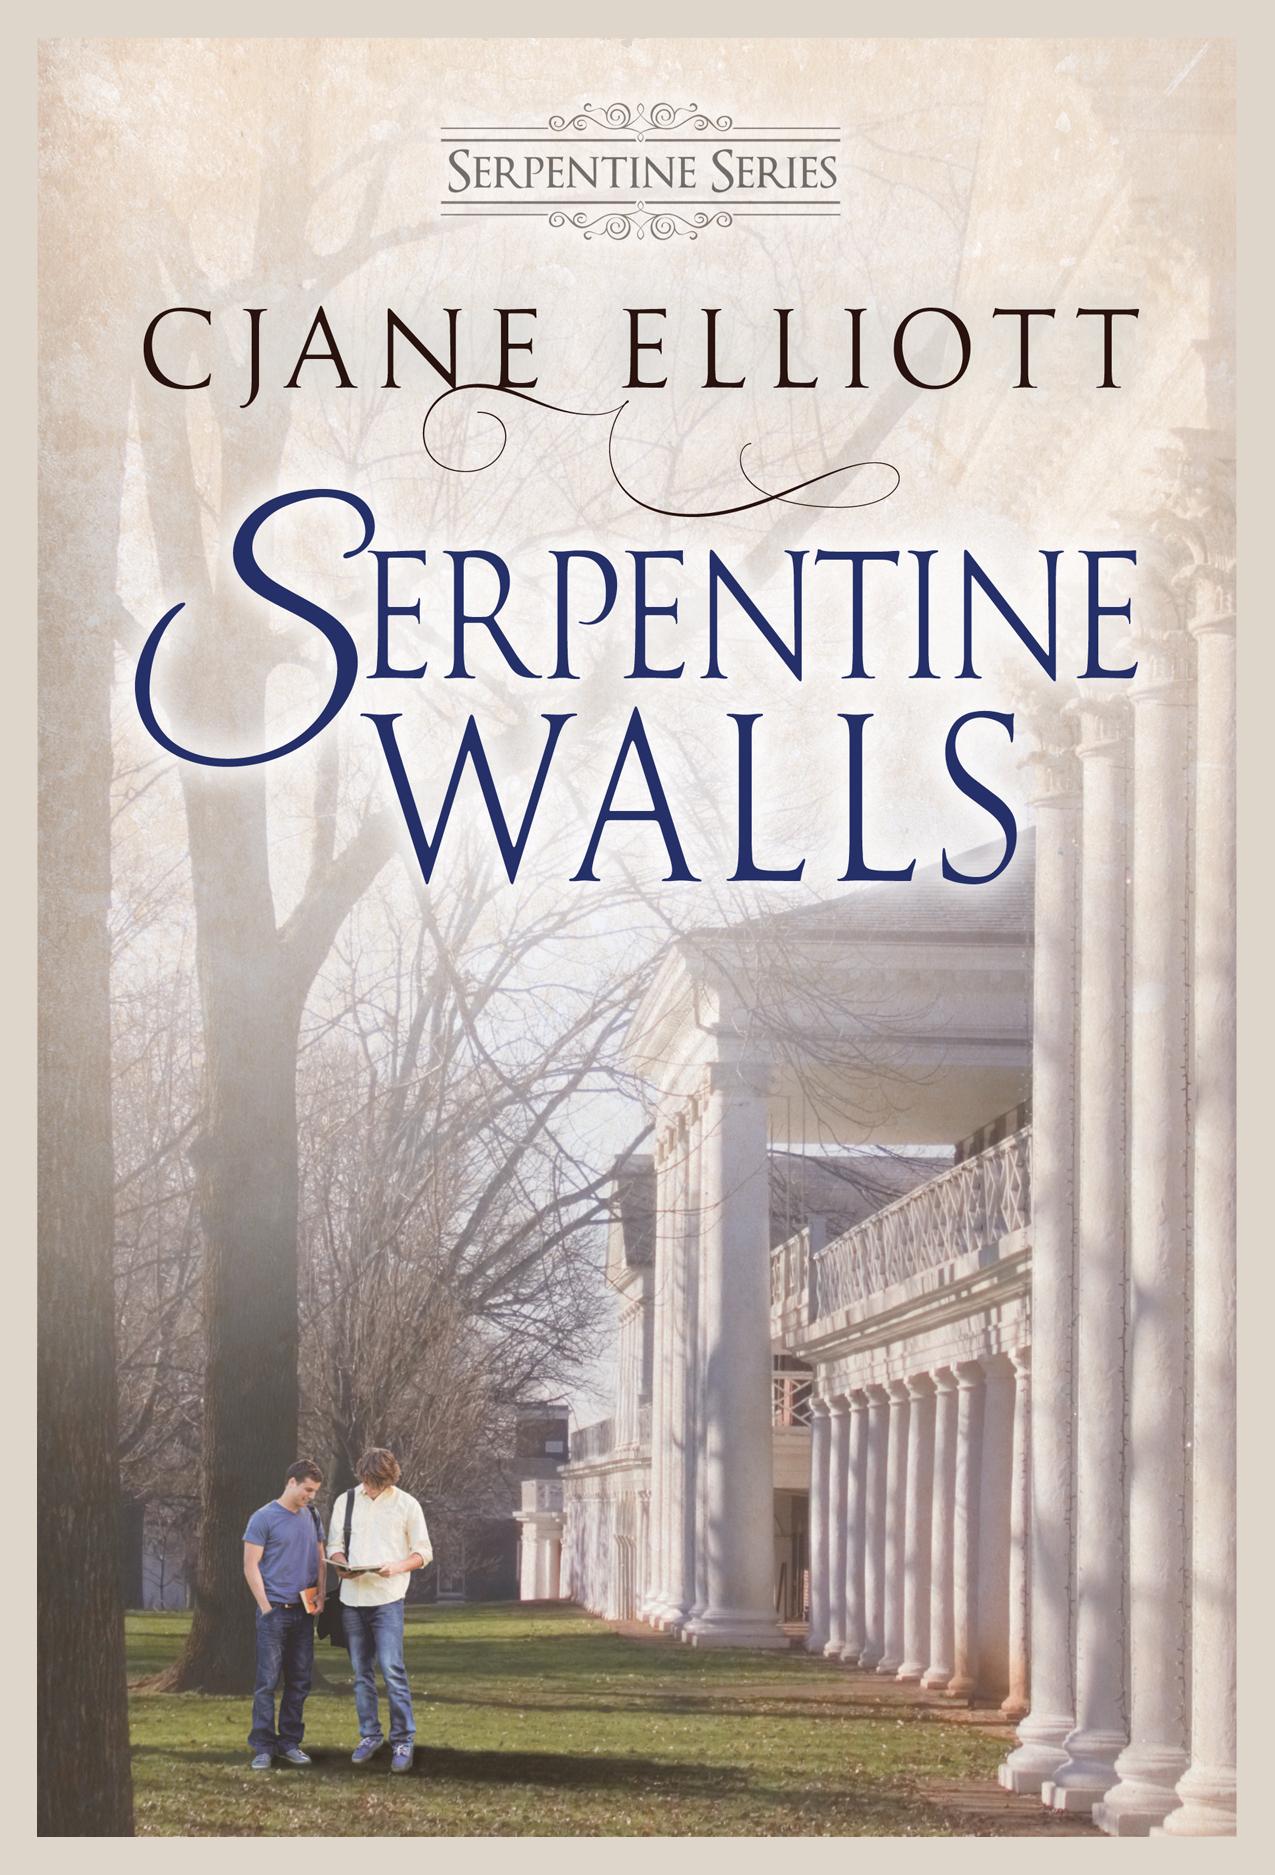 SerpentineWalls_postcard_front_DSP